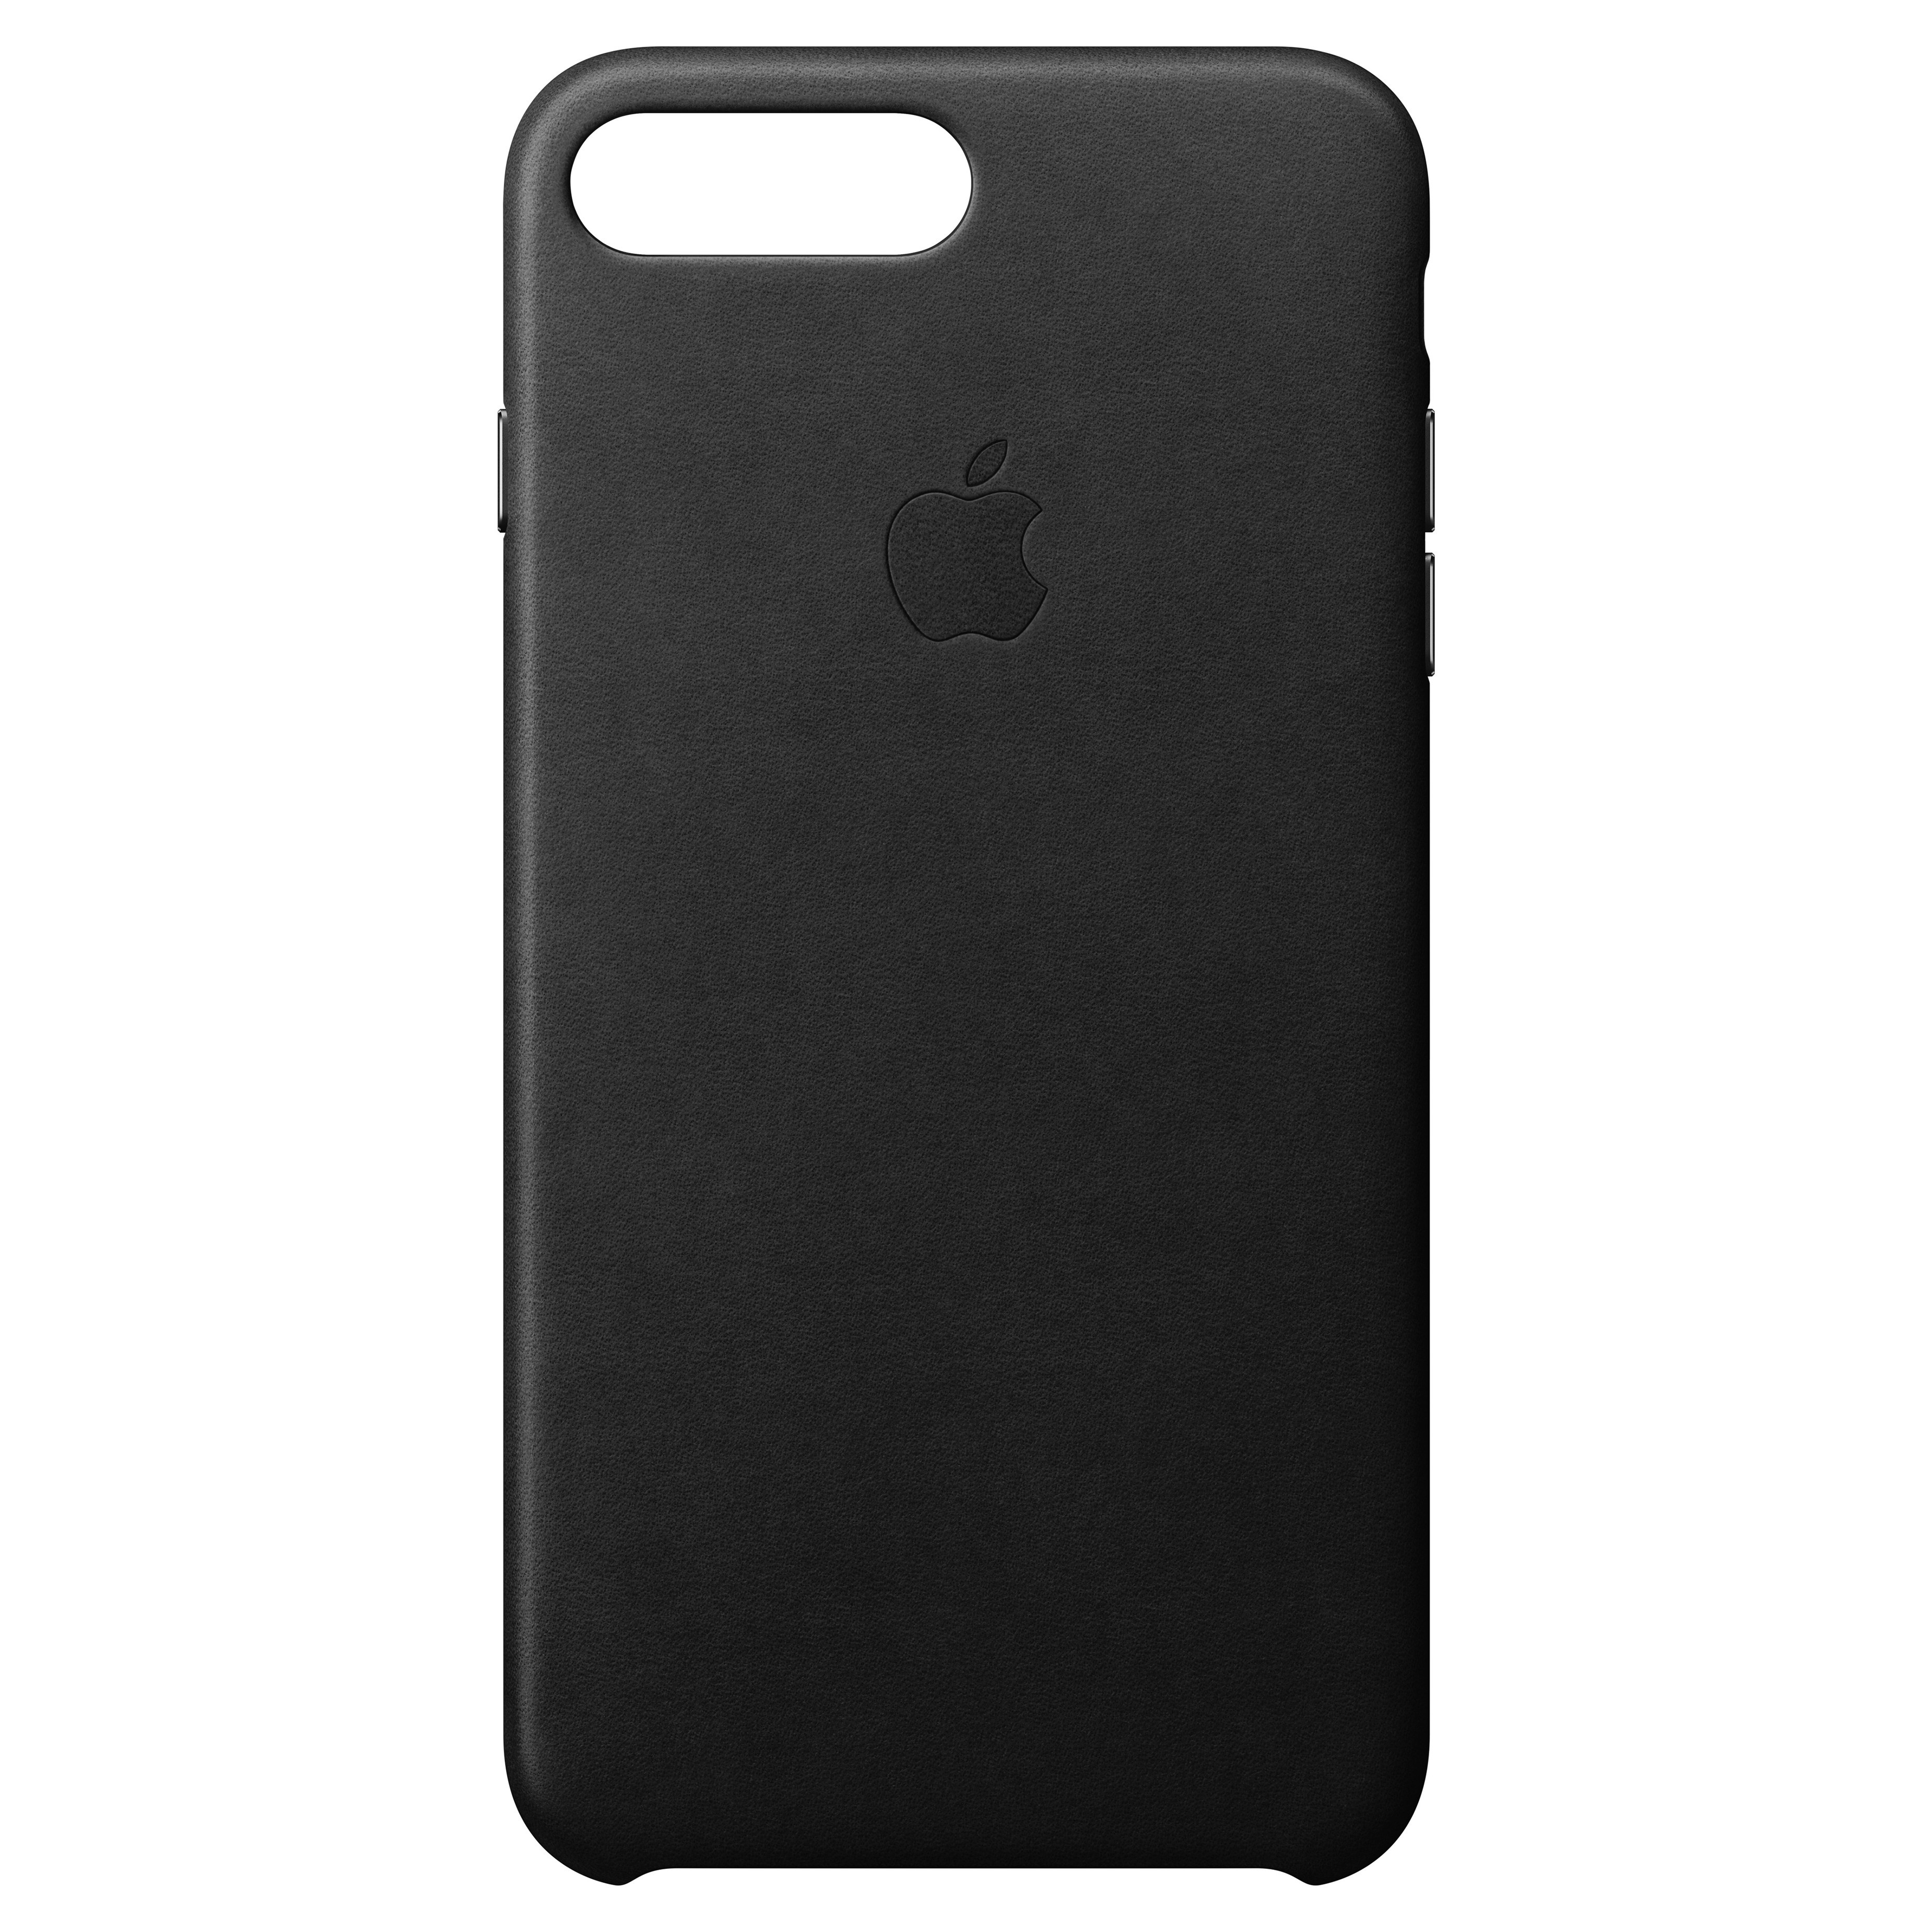 MQHM2ZM/A : iPhone 8 Plus skinndeksel (sort)